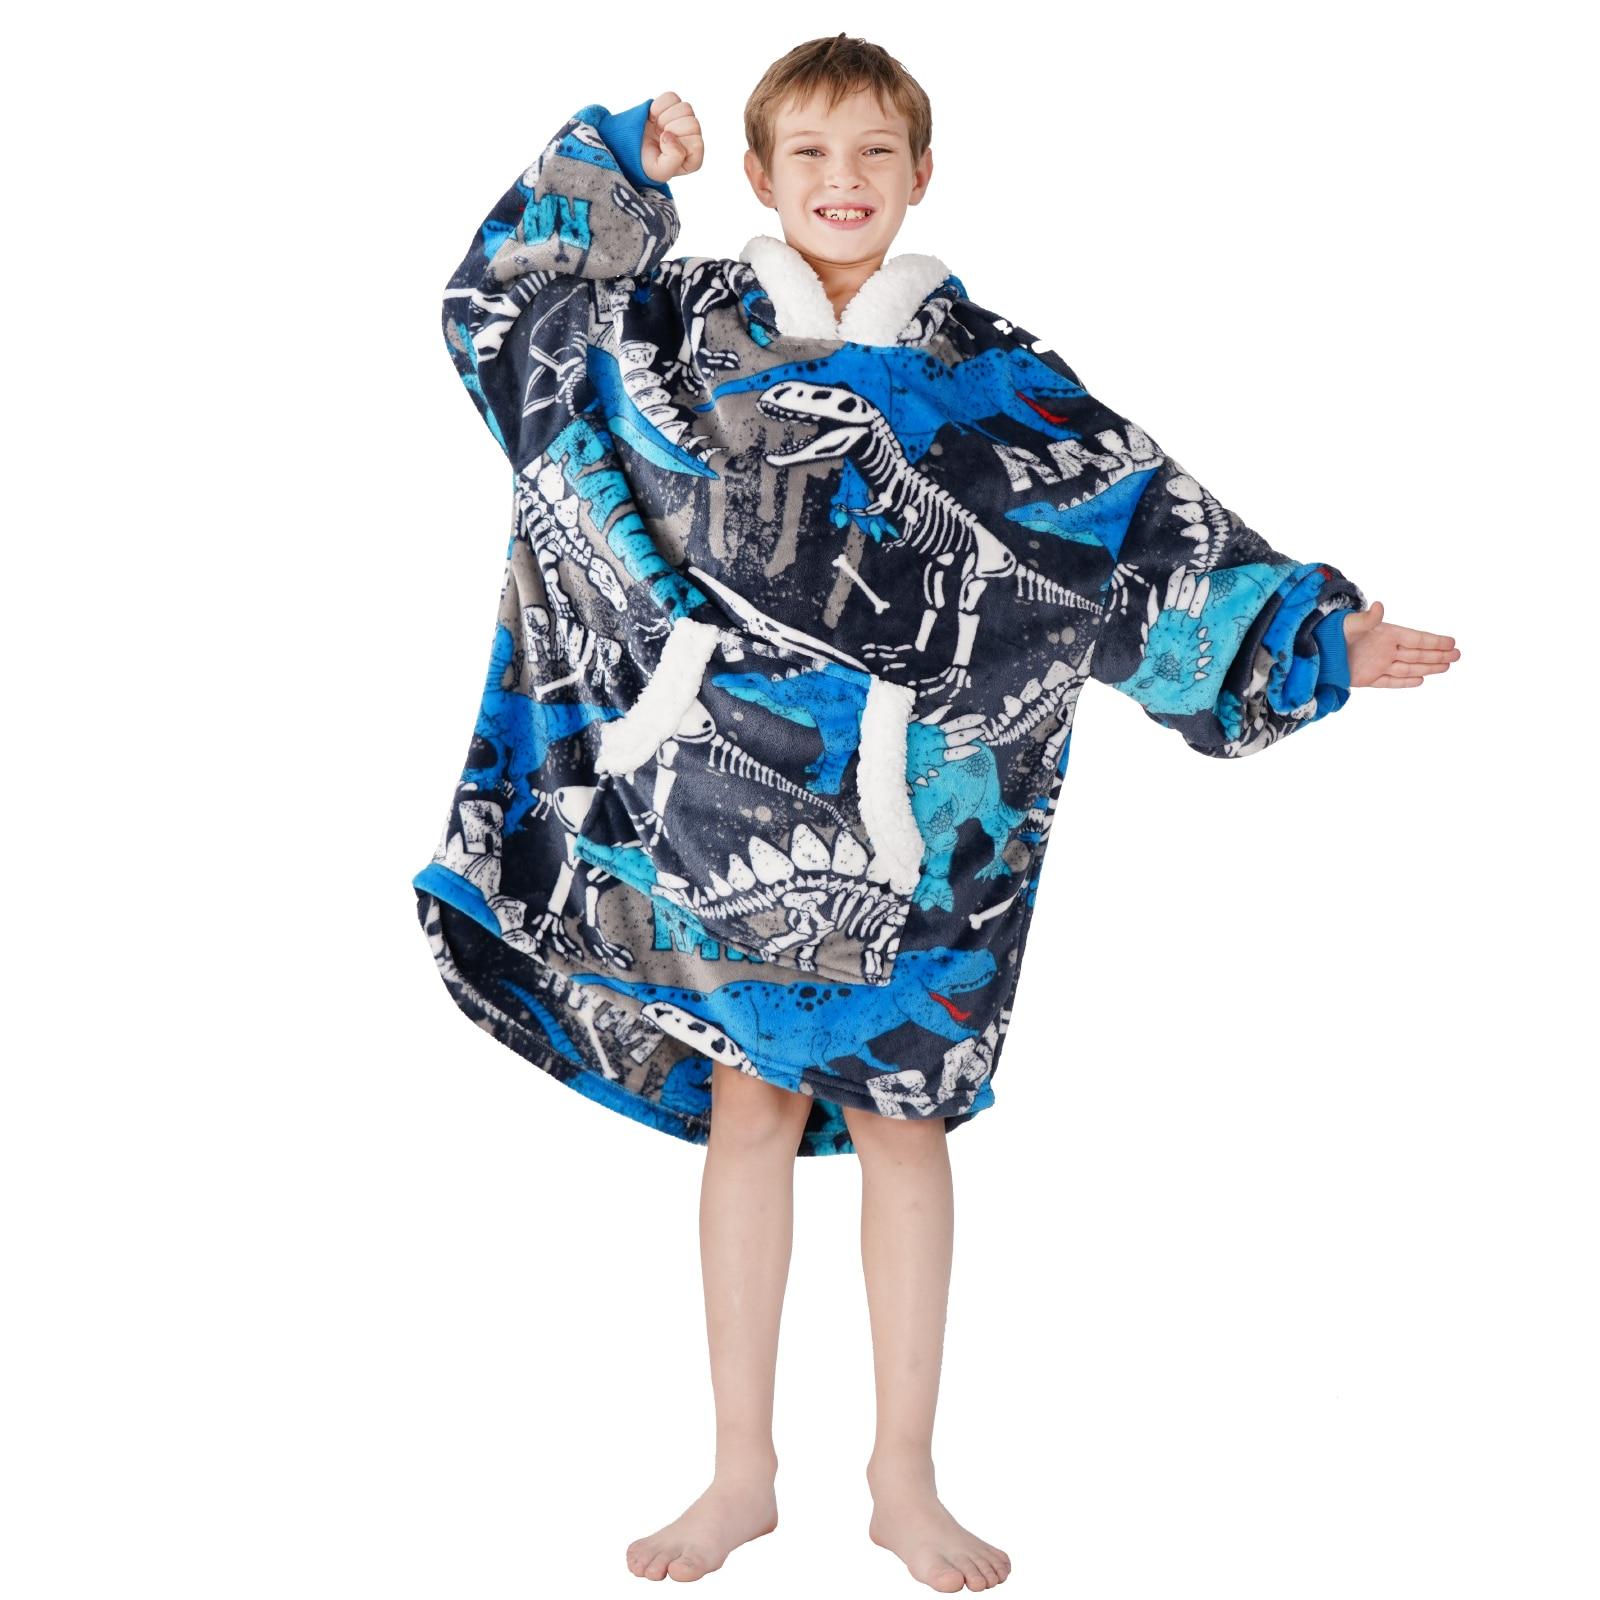 Winthome المتضخم بطانية هوديي للأطفال بنين بنات ، دافئ فائق النعومة بلوزة من الصوف بطانية هودي